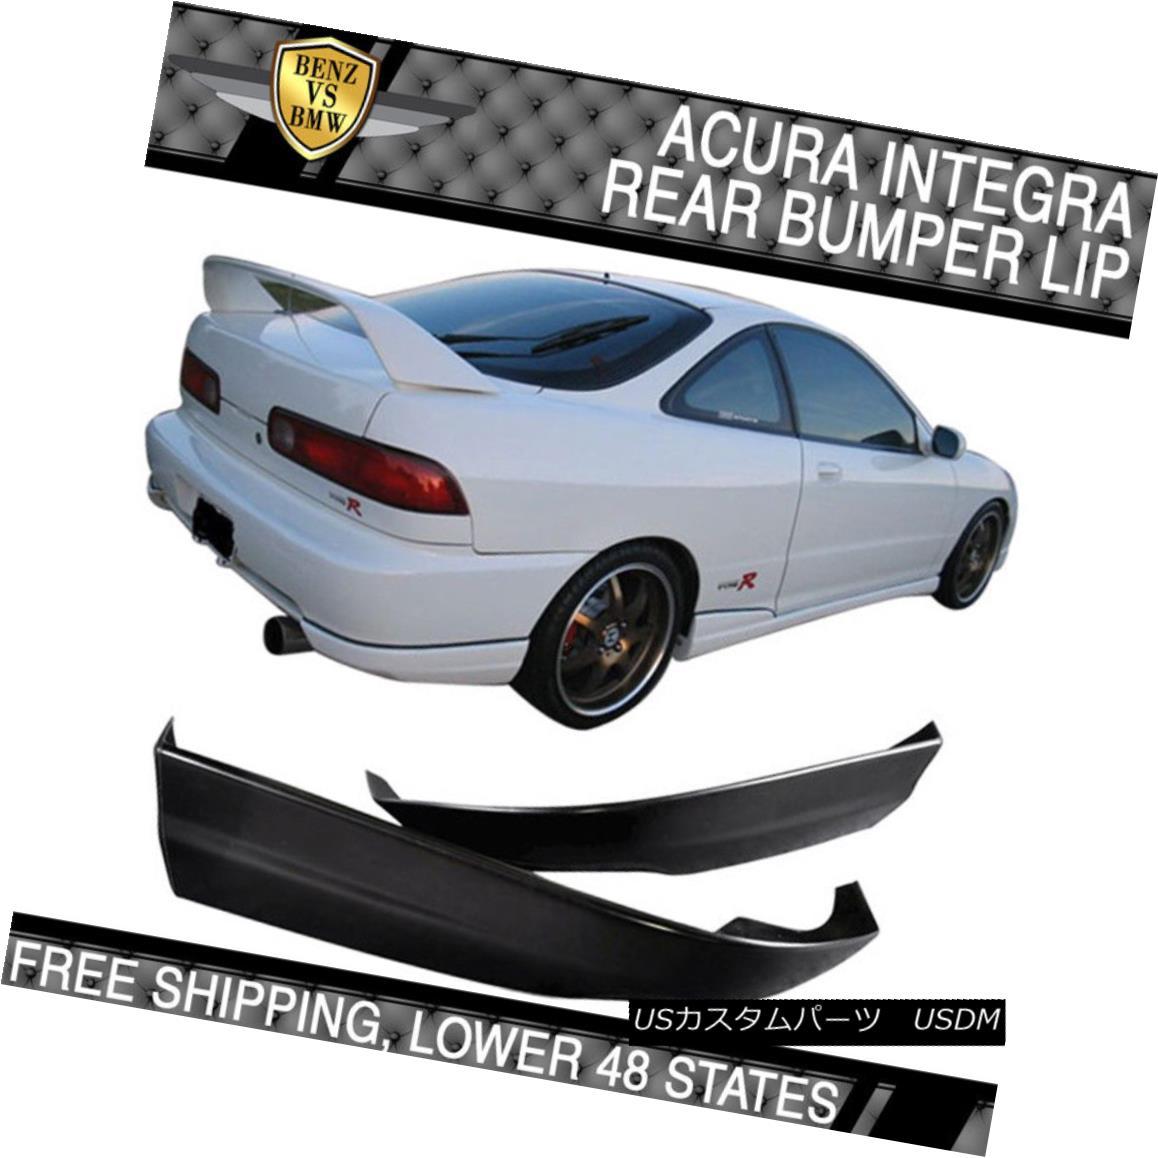 Poly Urethane Rear Bumper Lip Spoiler Bodykit Fits 98-01 Acura Integra